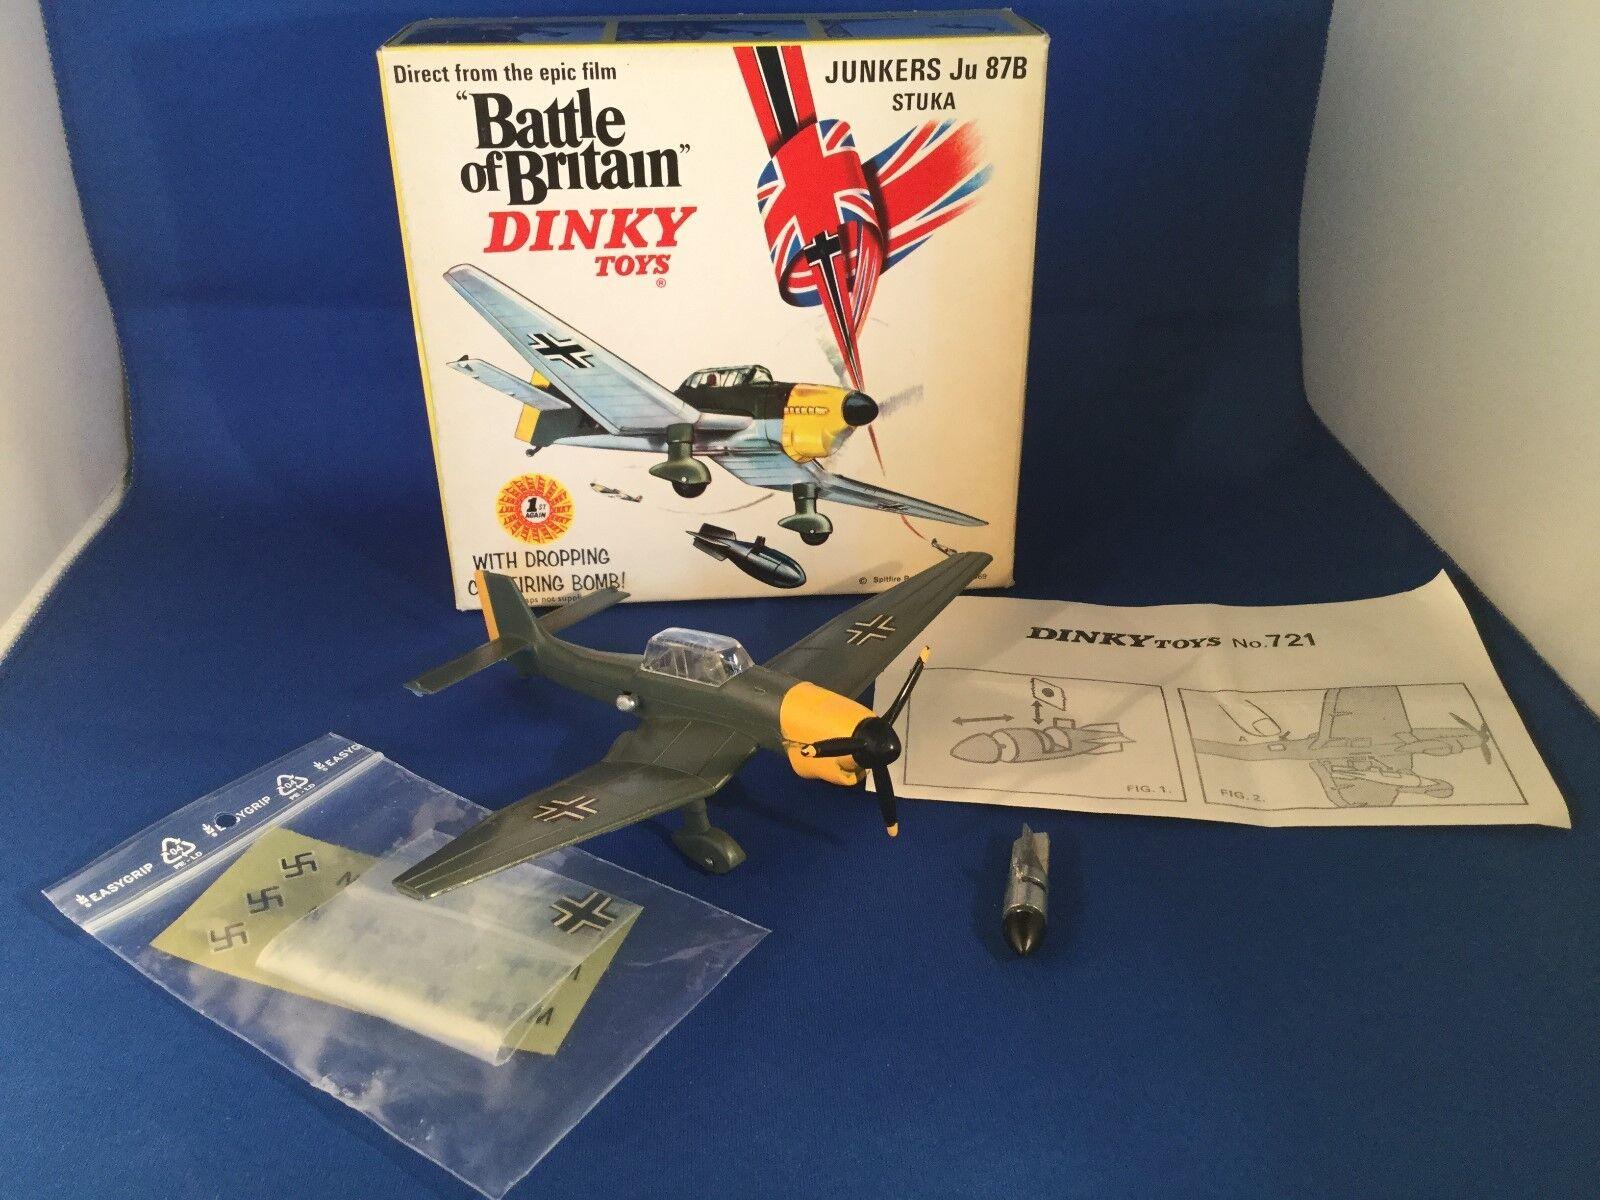 Dinky Toys Battle of Britain no. 721 Junkers Ju 87B Stuka ovp